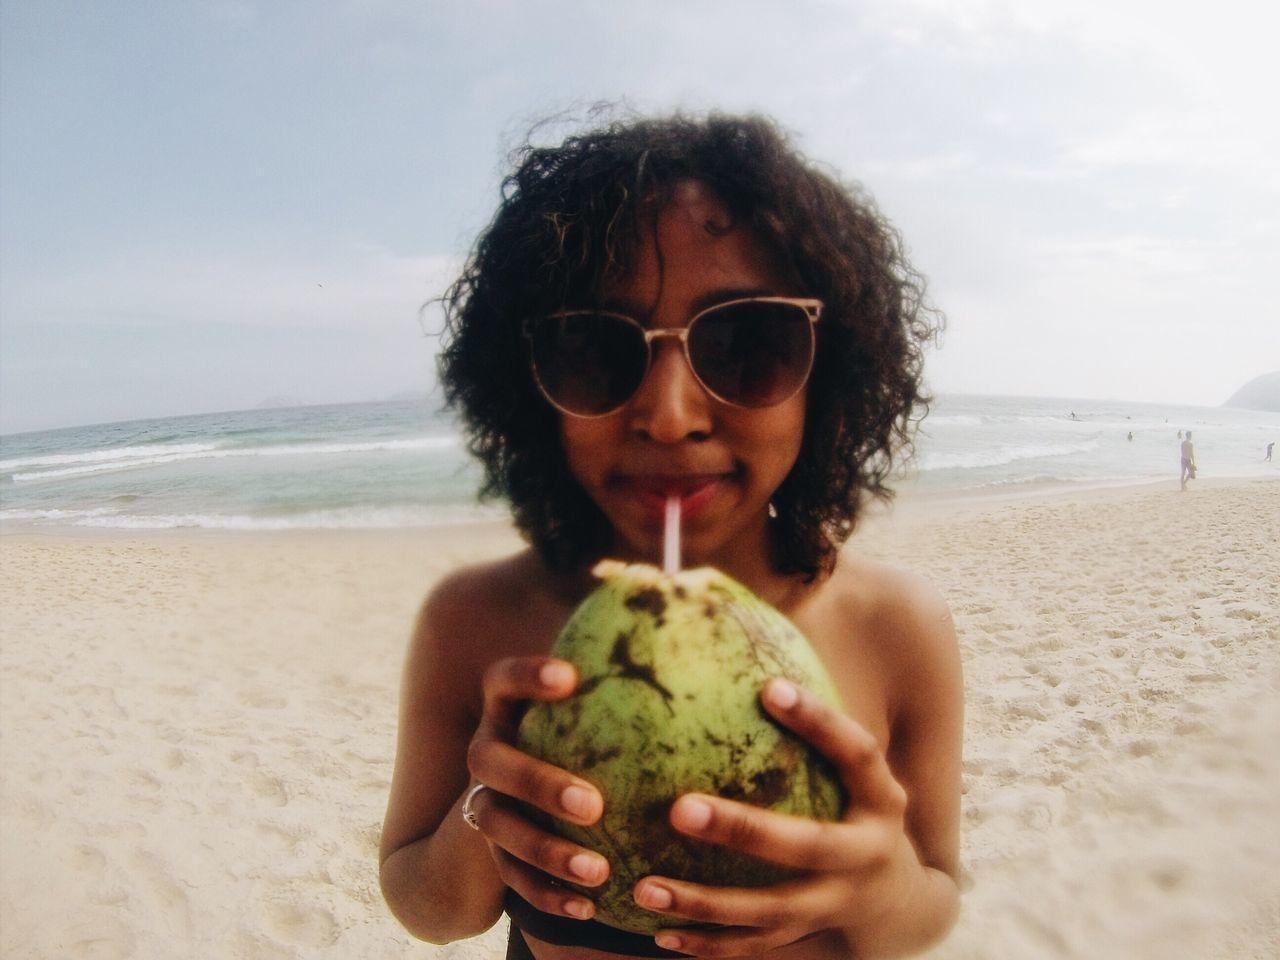 vida de praia 😎 Rio De Janeiro Ipanema Beach Coconut Beach Life